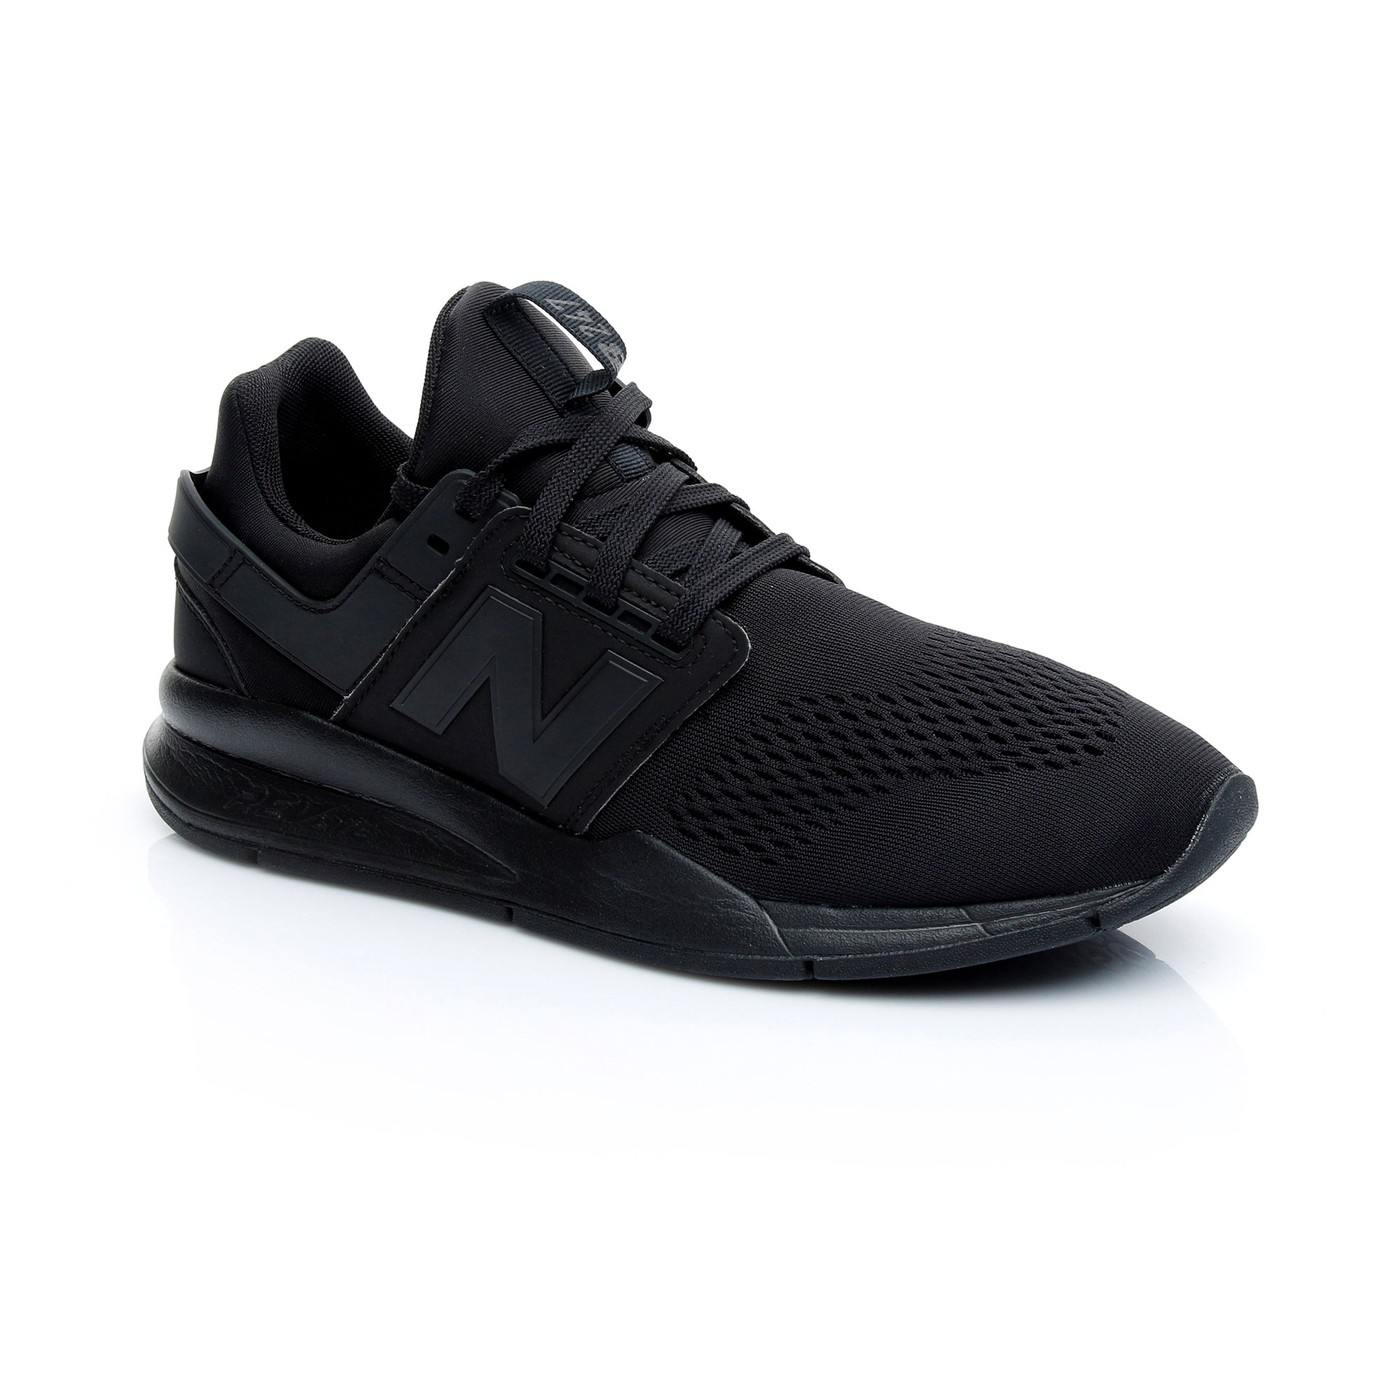 new balance 247 black suede